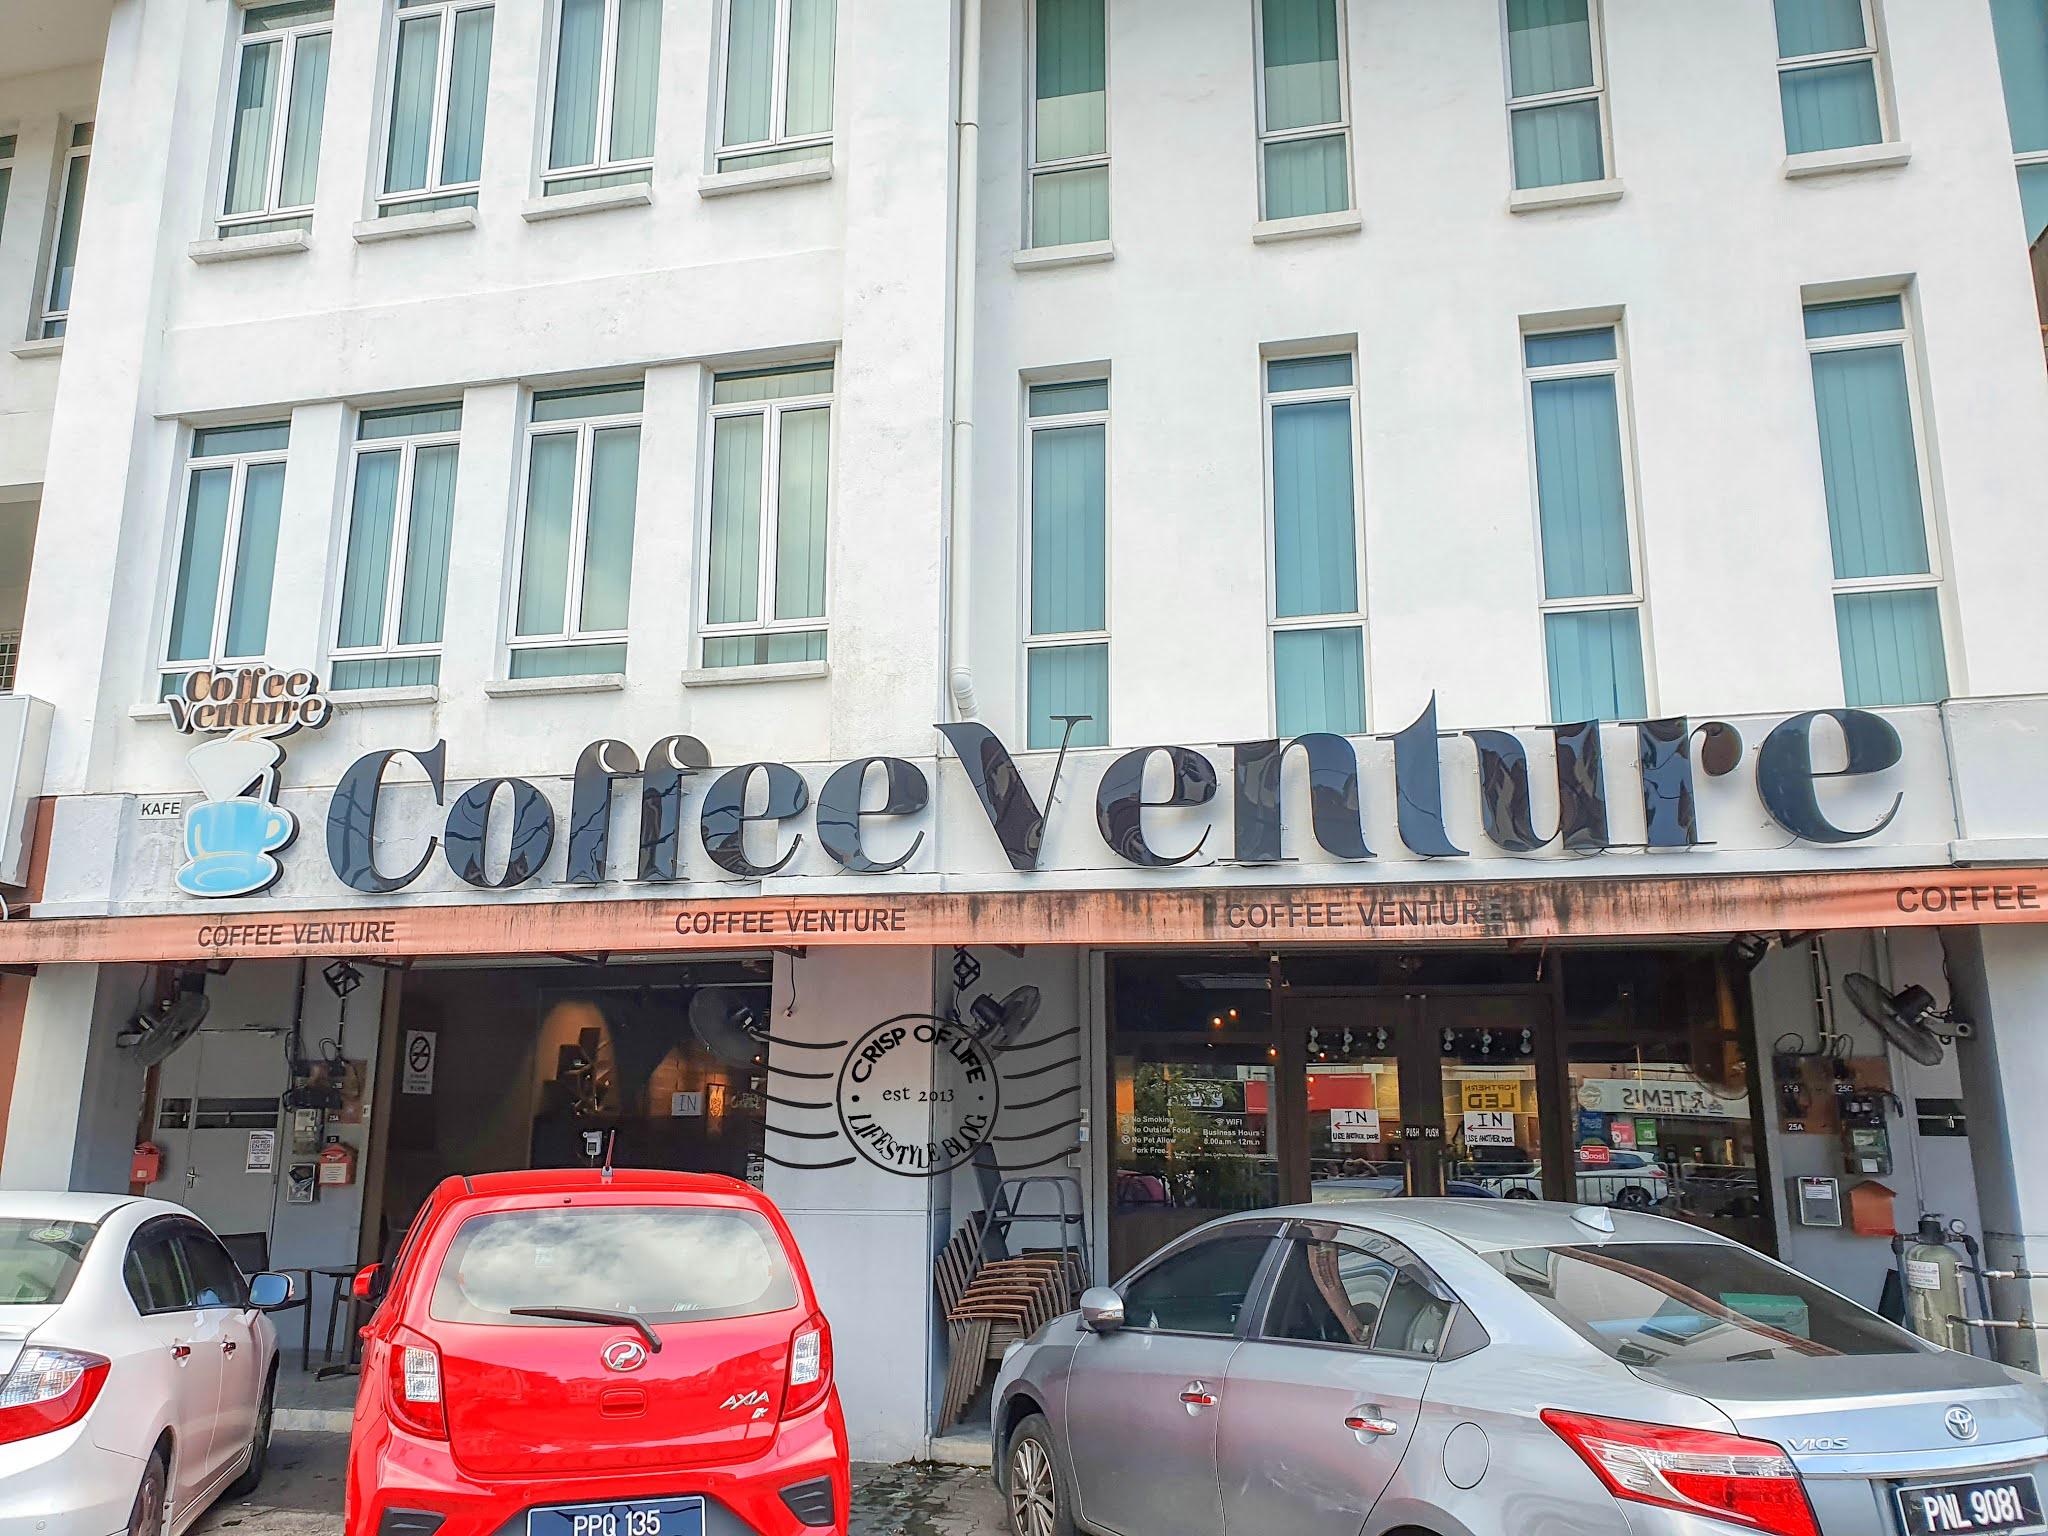 Coffee Venture @ Raja Uda, Butterworth, Penang